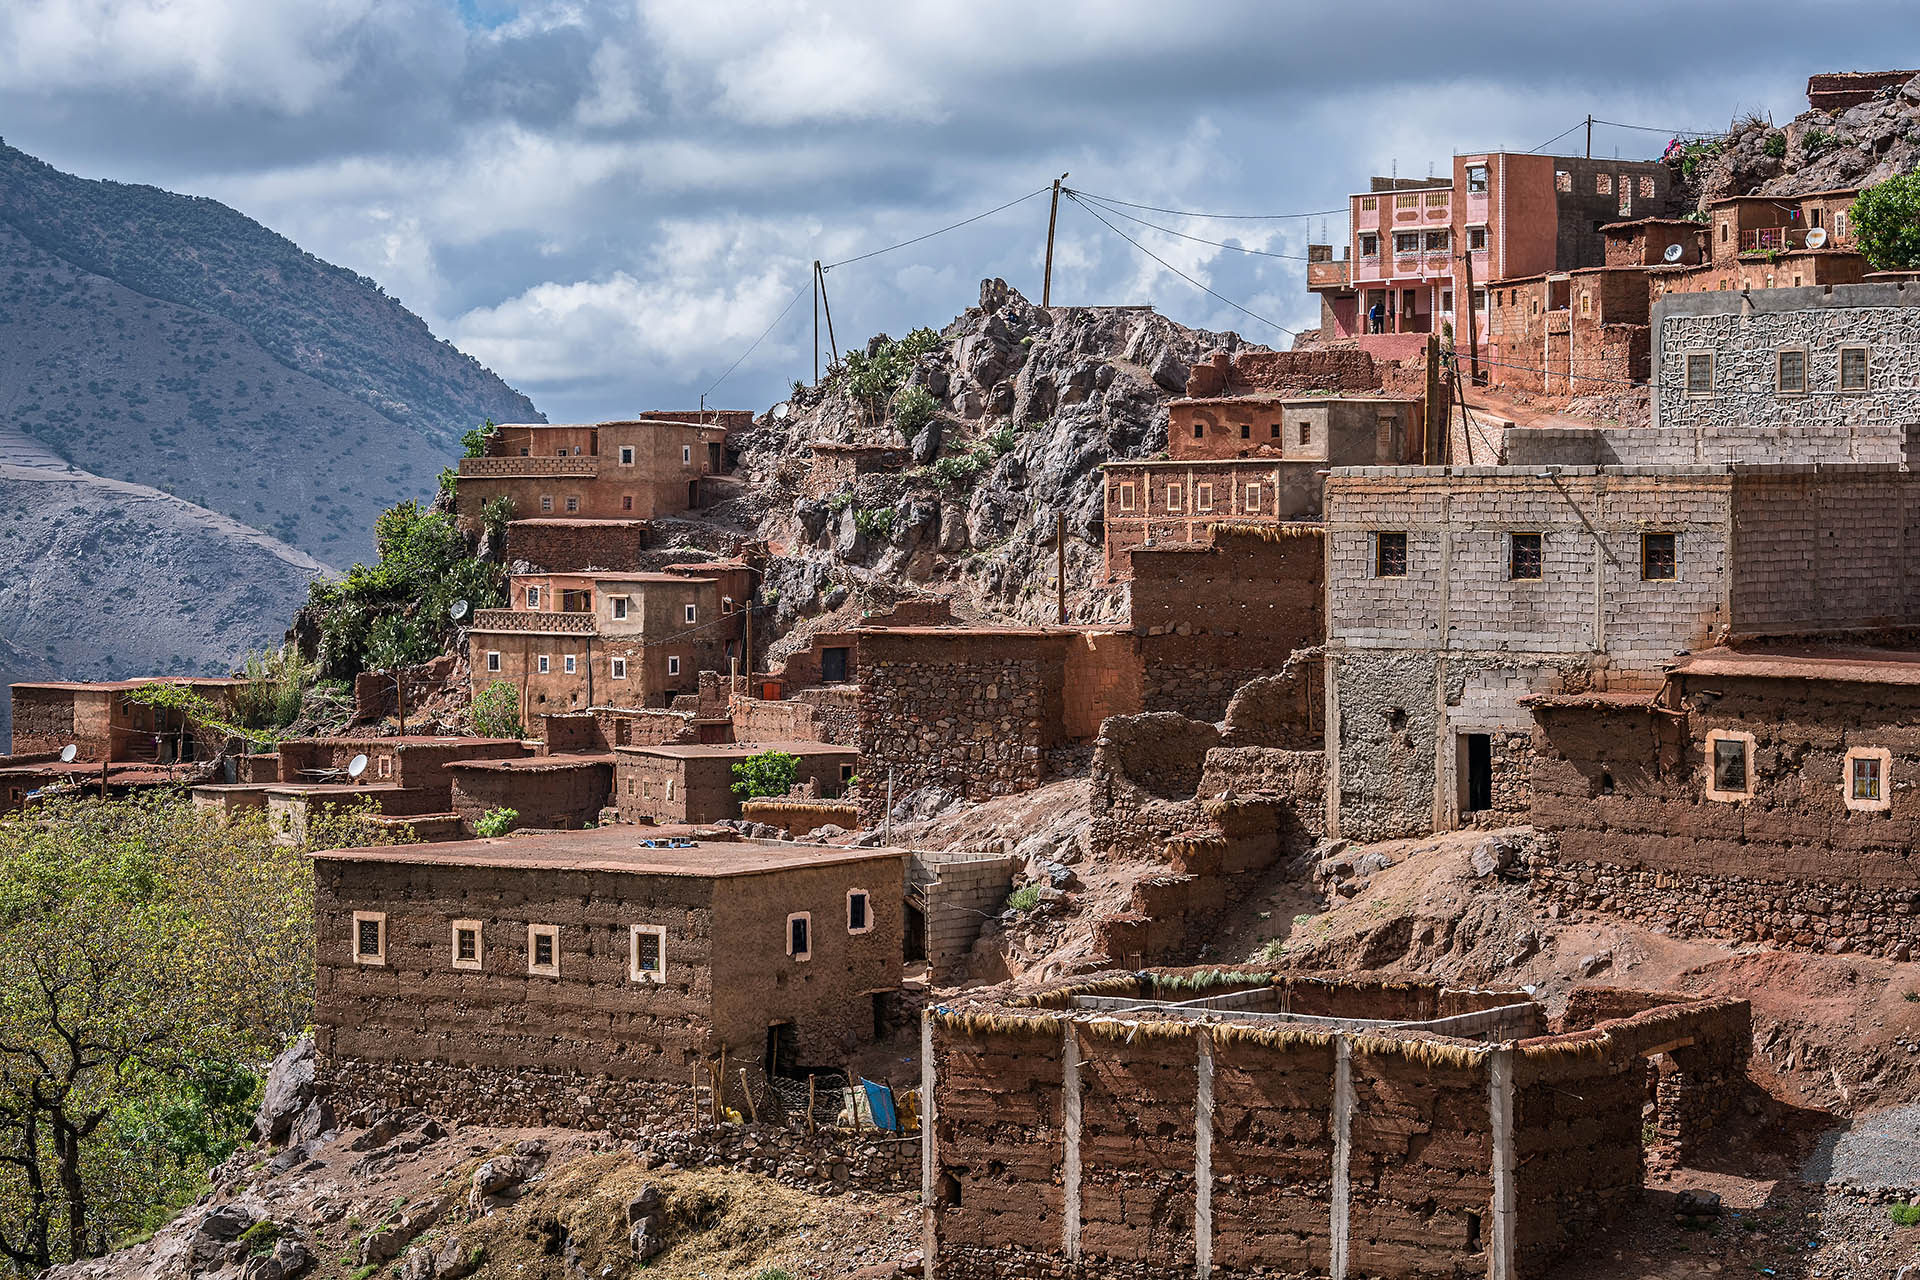 houses, Id Issa Village, Azzaden Valley, High Atlas Mountains, Morocco